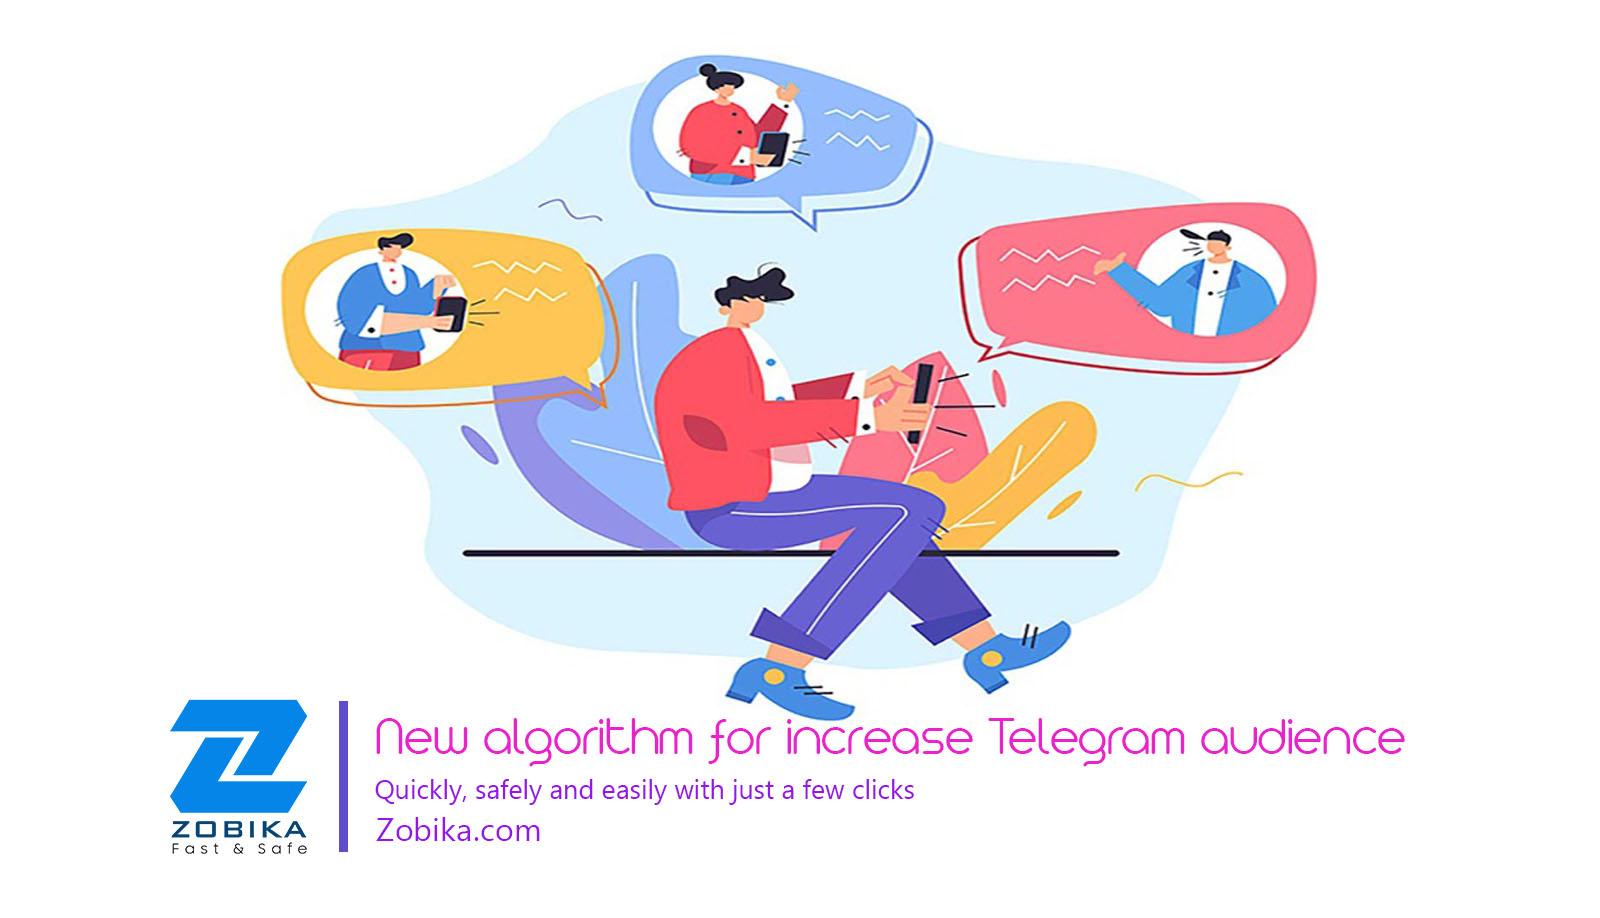 New algorithm for increase Telegram in 2021